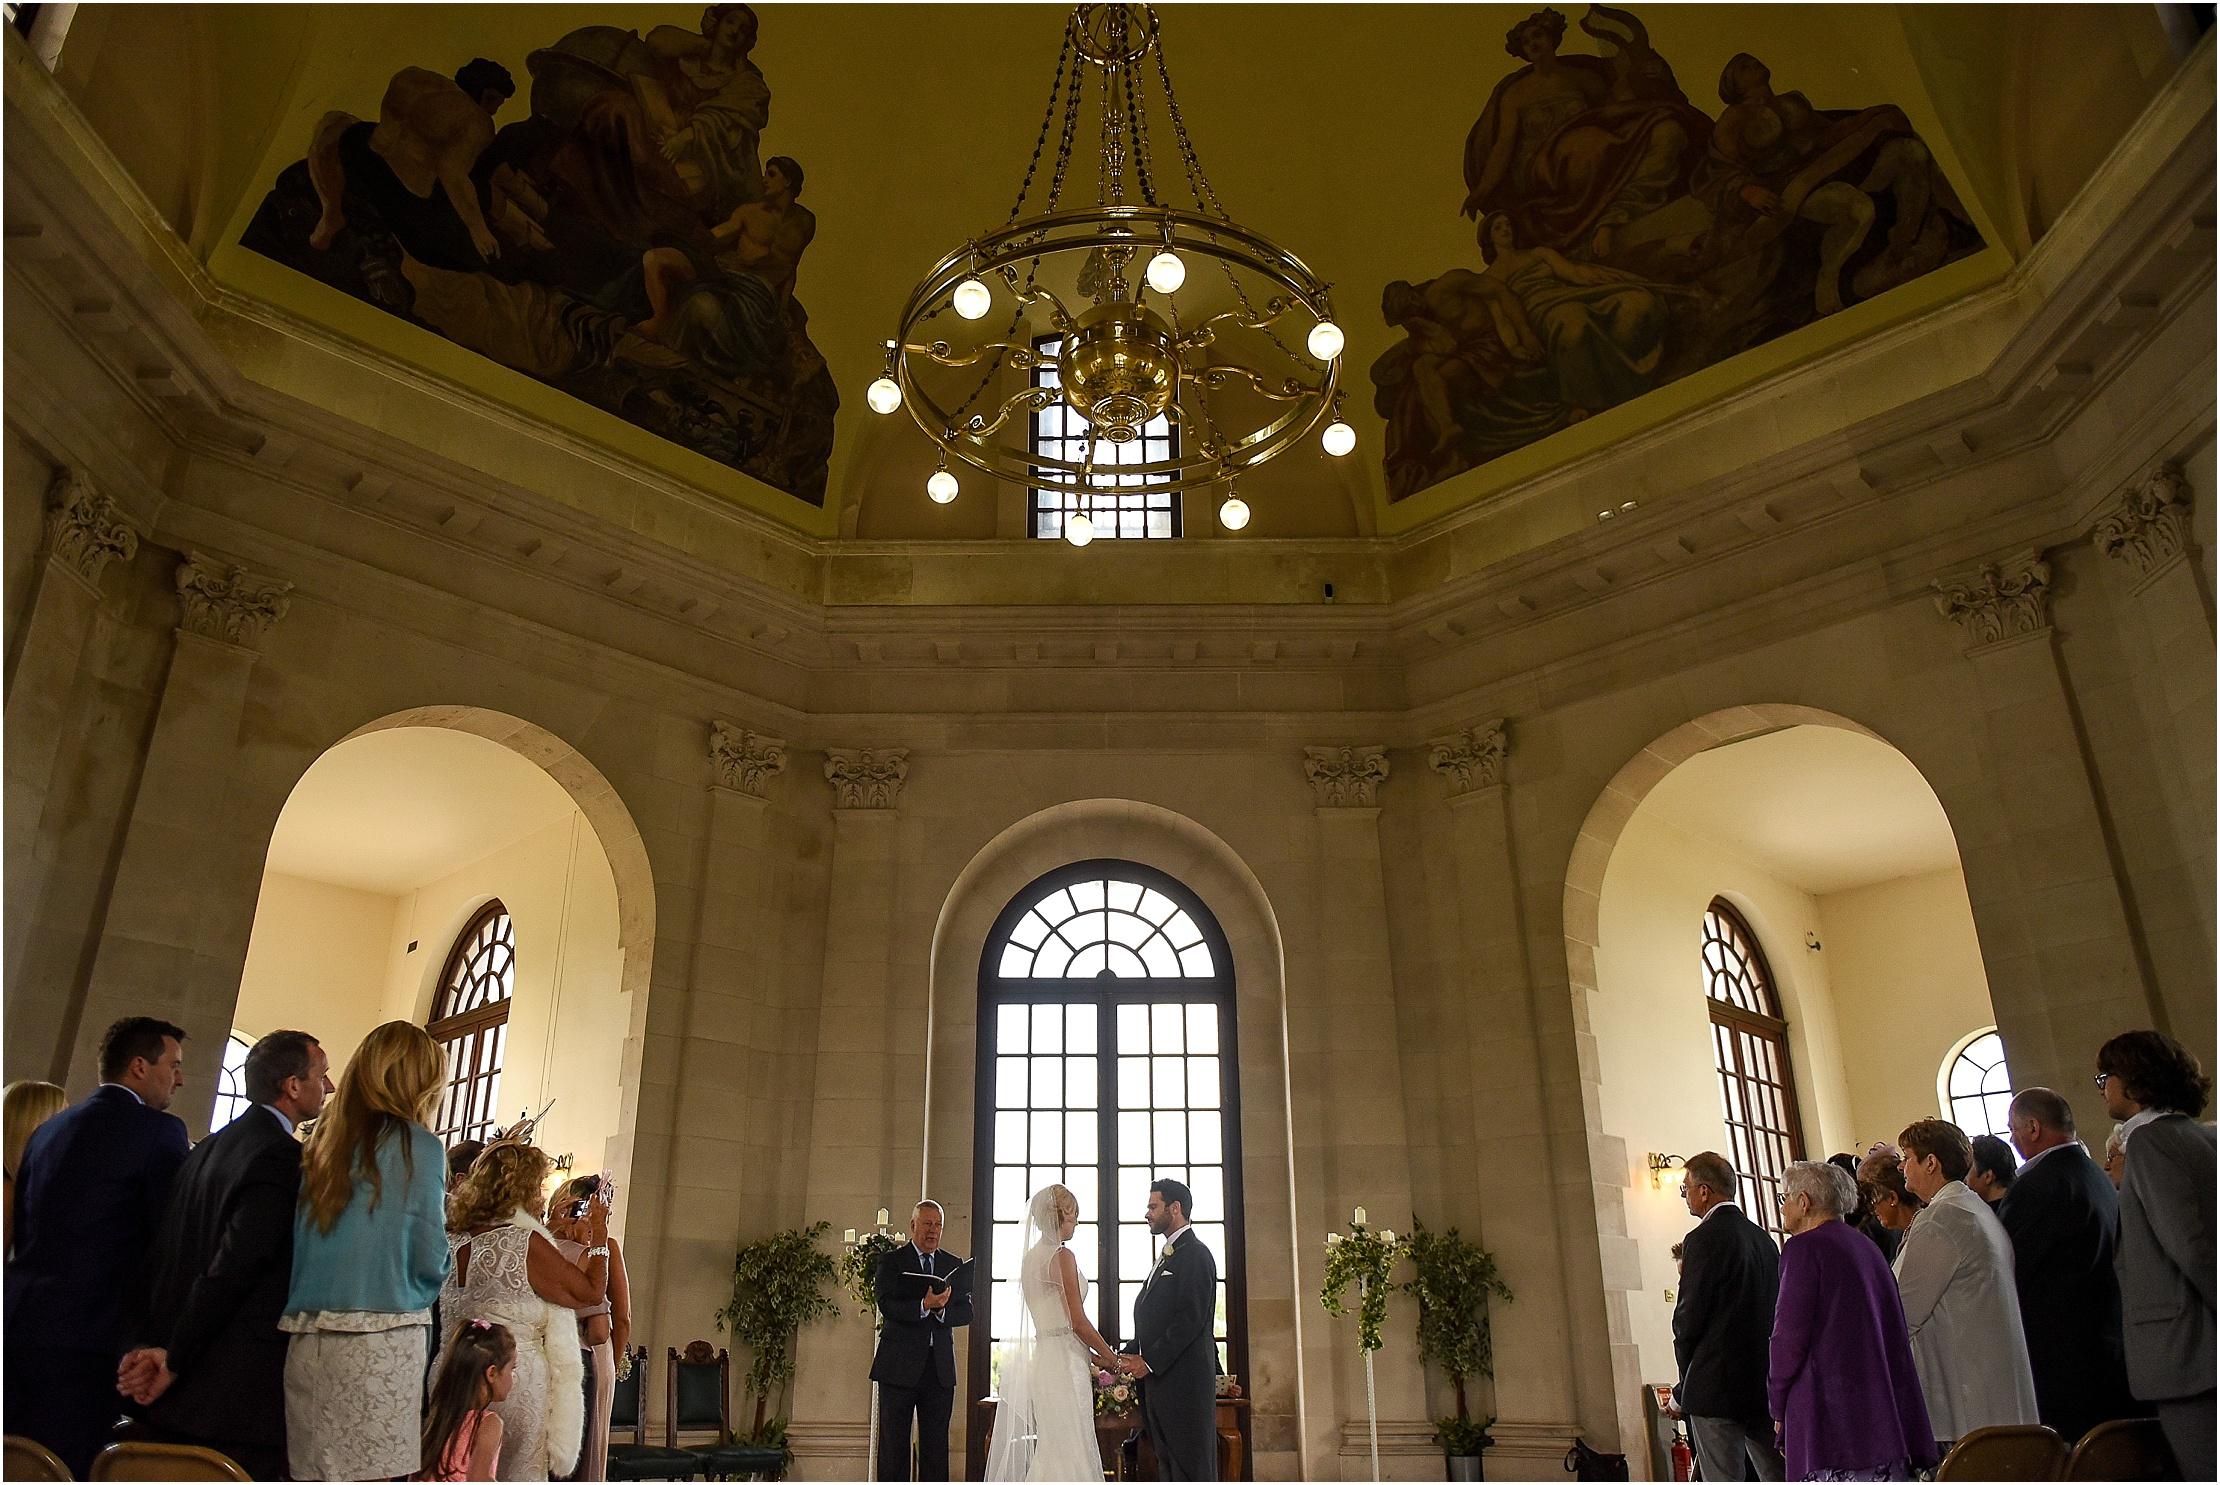 staining-lodge-wedding-056.jpg